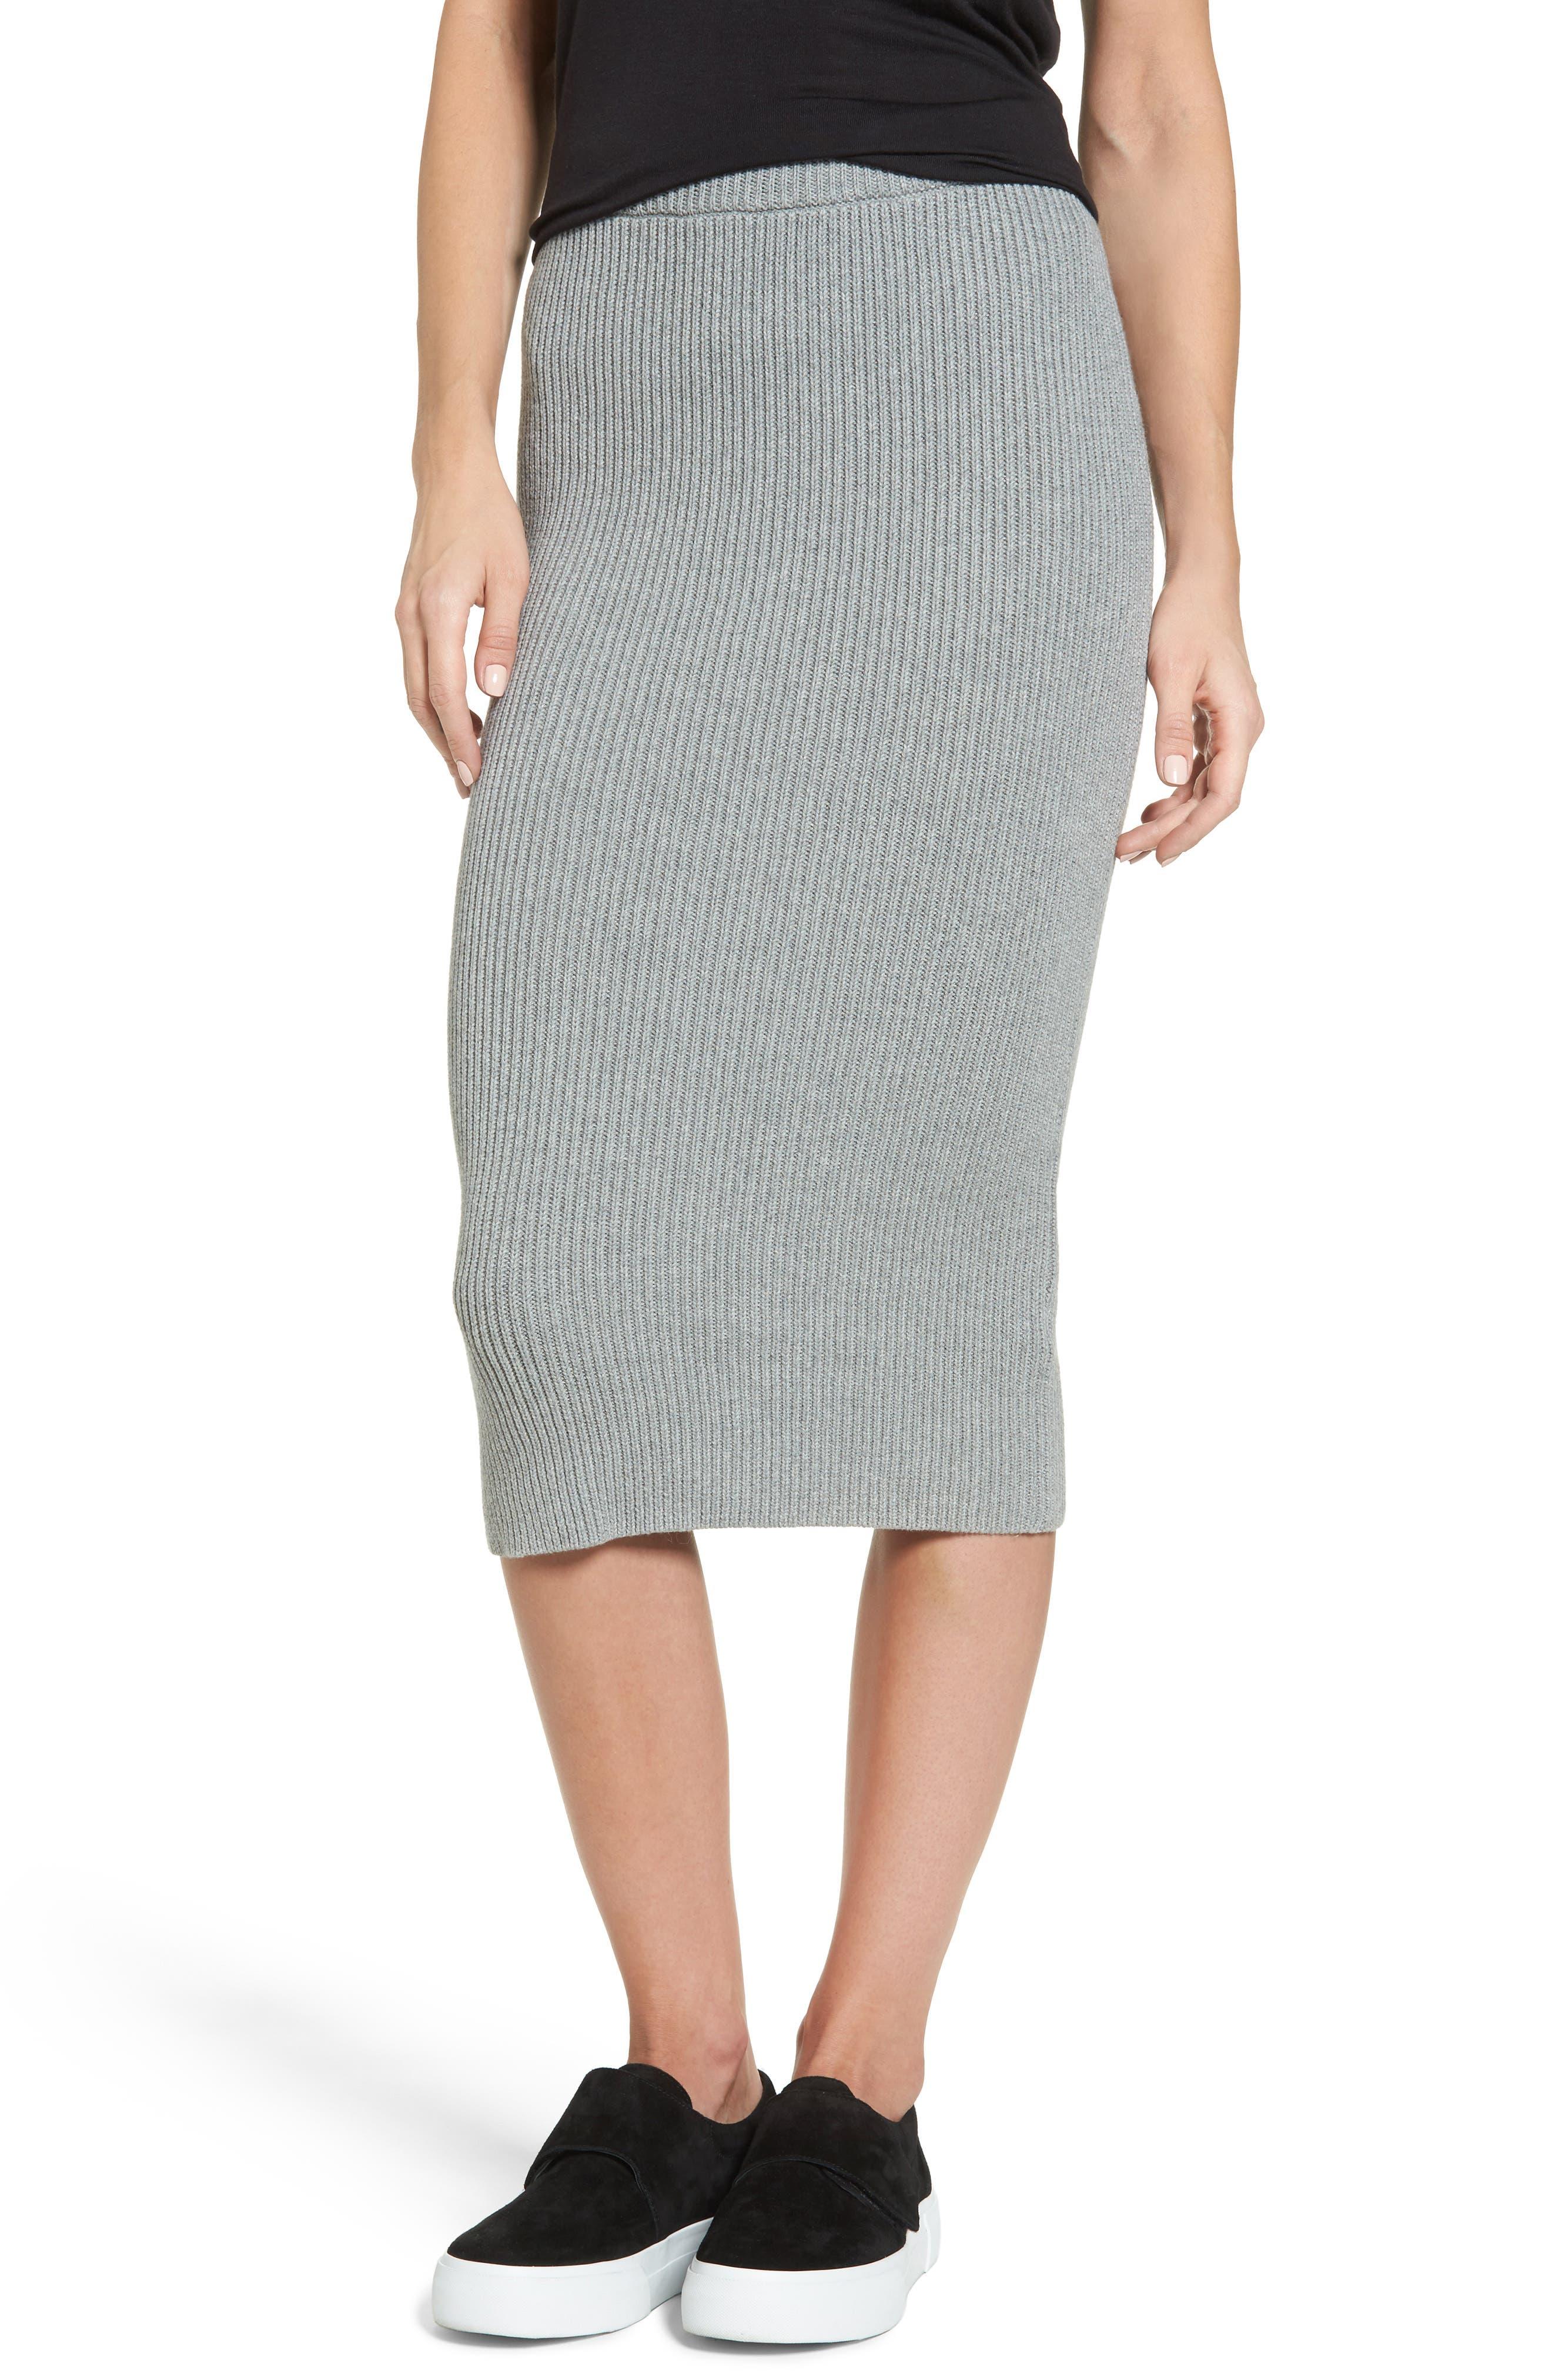 Galactic Knit Skirt,                         Main,                         color, 051